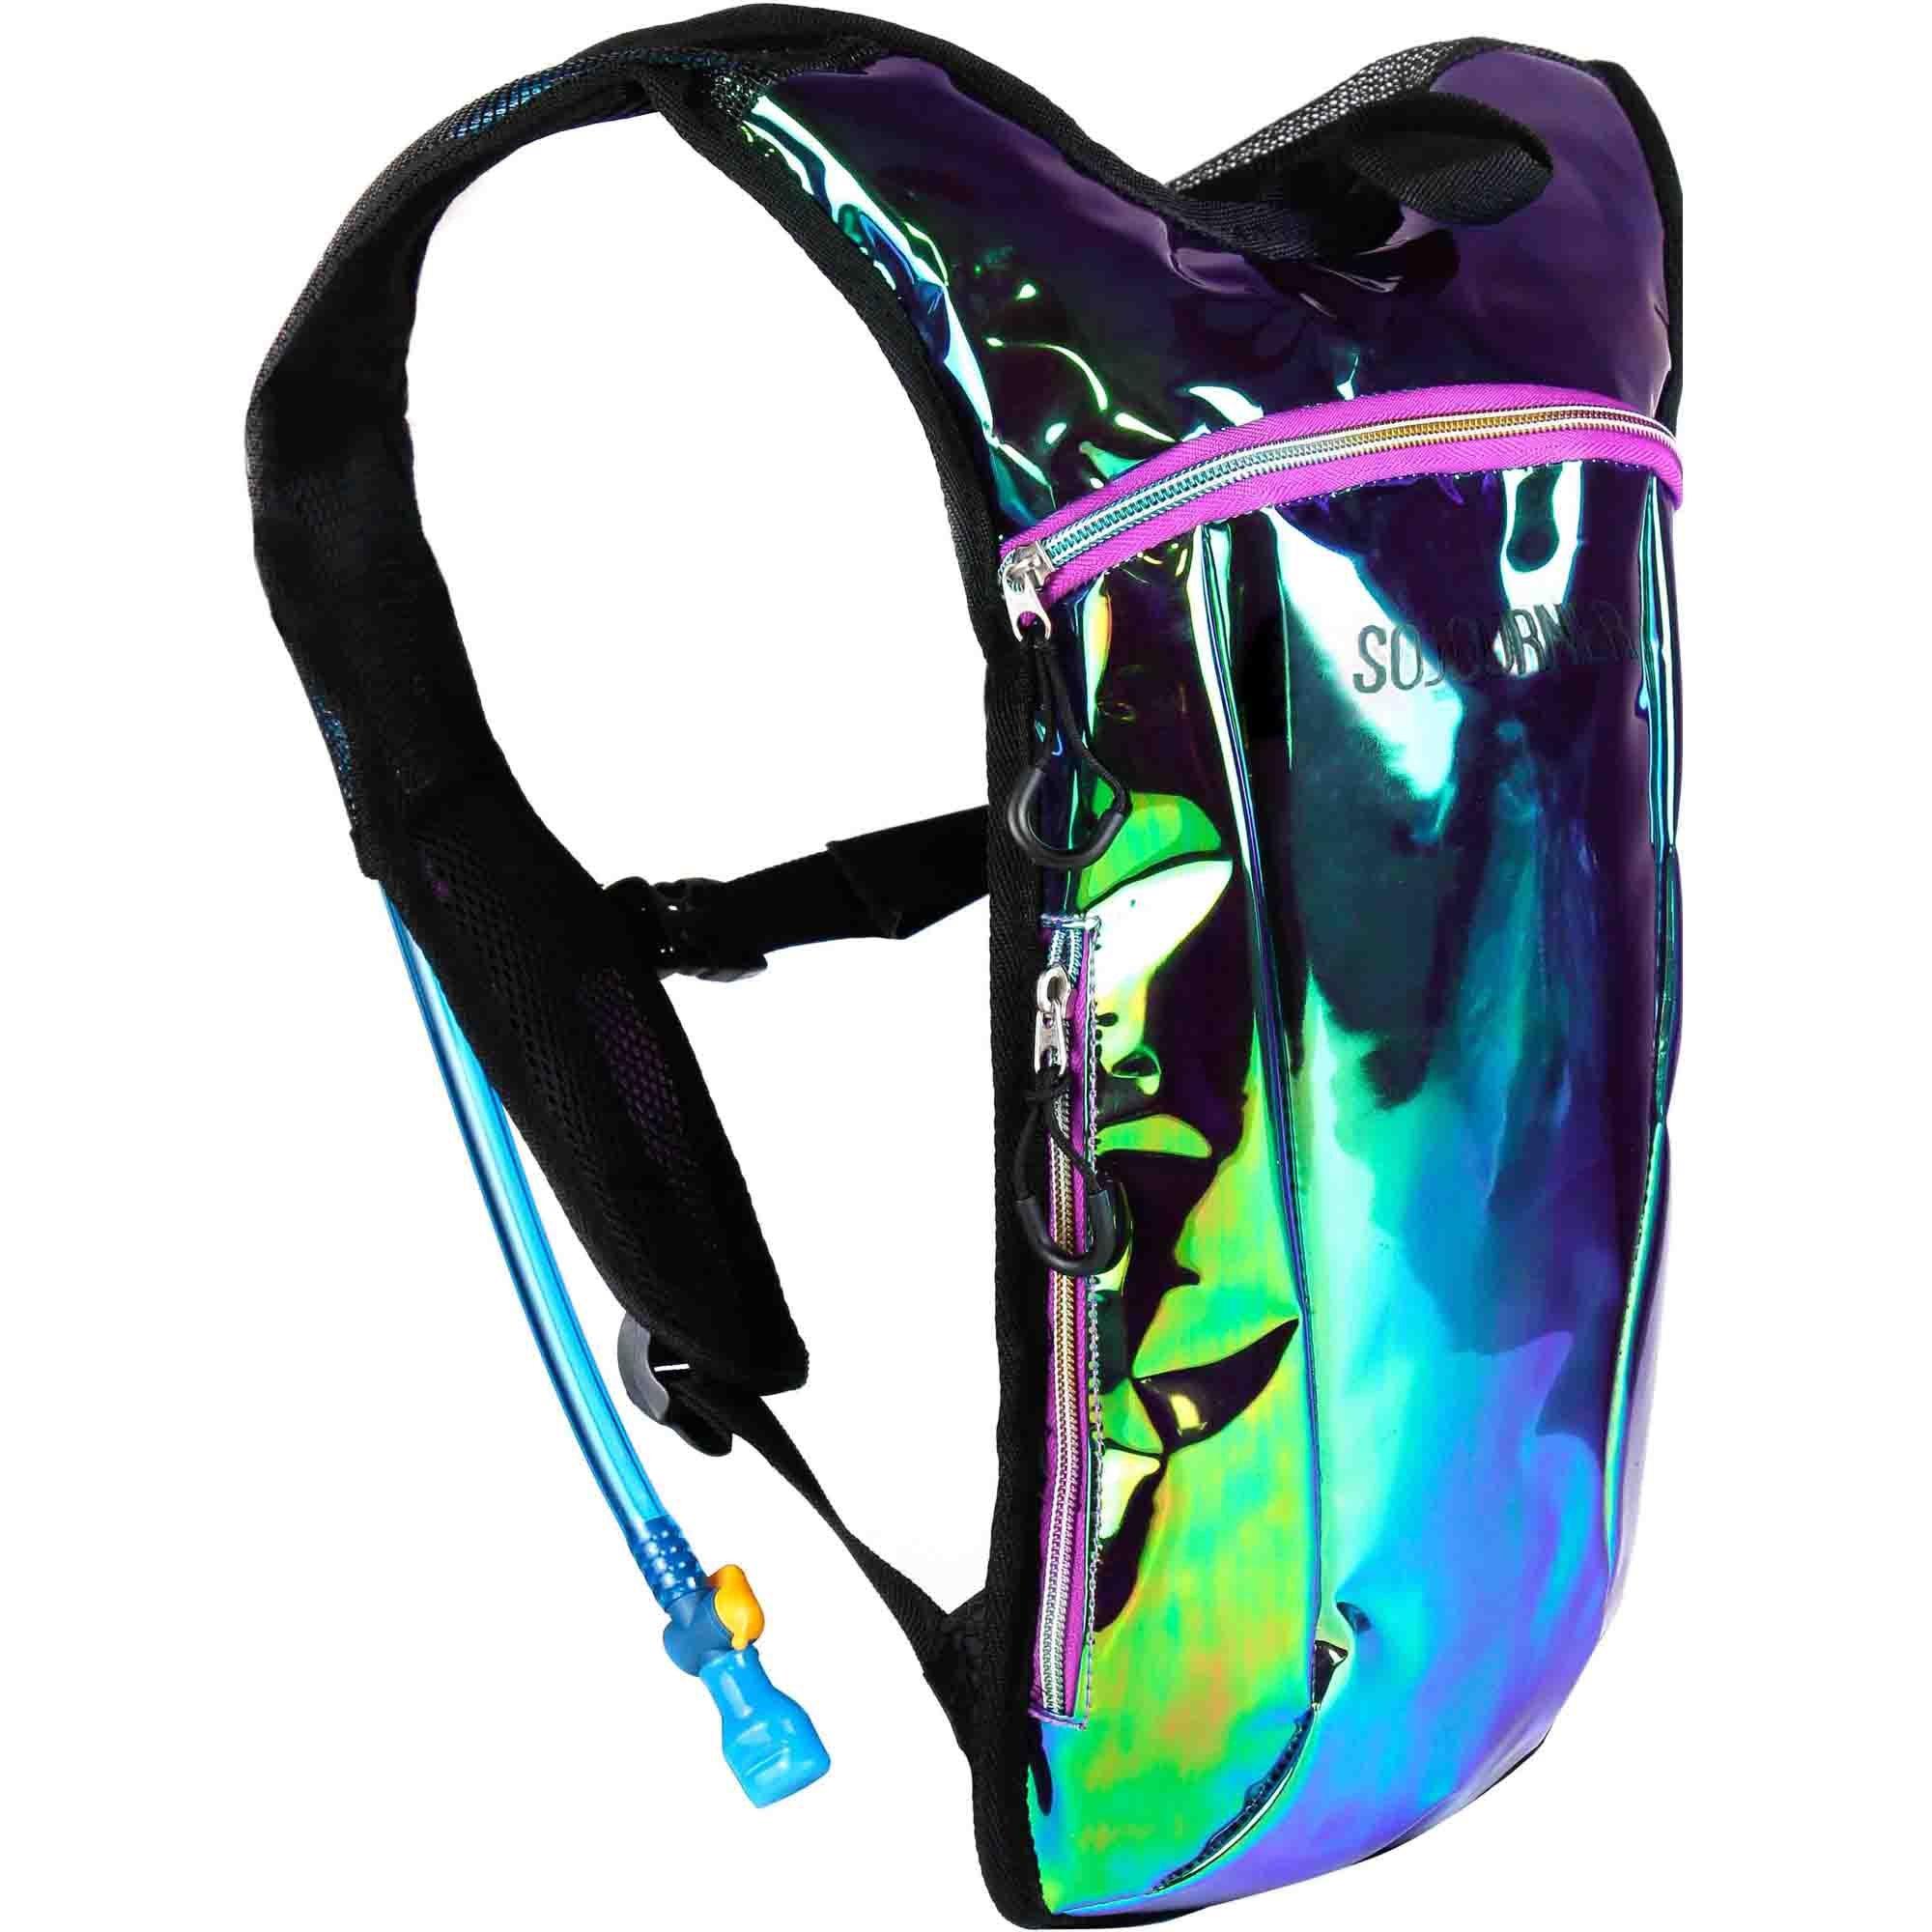 Sojourner Rave Hydration Pack Backpack - 2L Water Bladder Included for Festivals, Raves, Hiking, Biking, Climbing, Running (Laser Green Purple) by SoJourner Bags